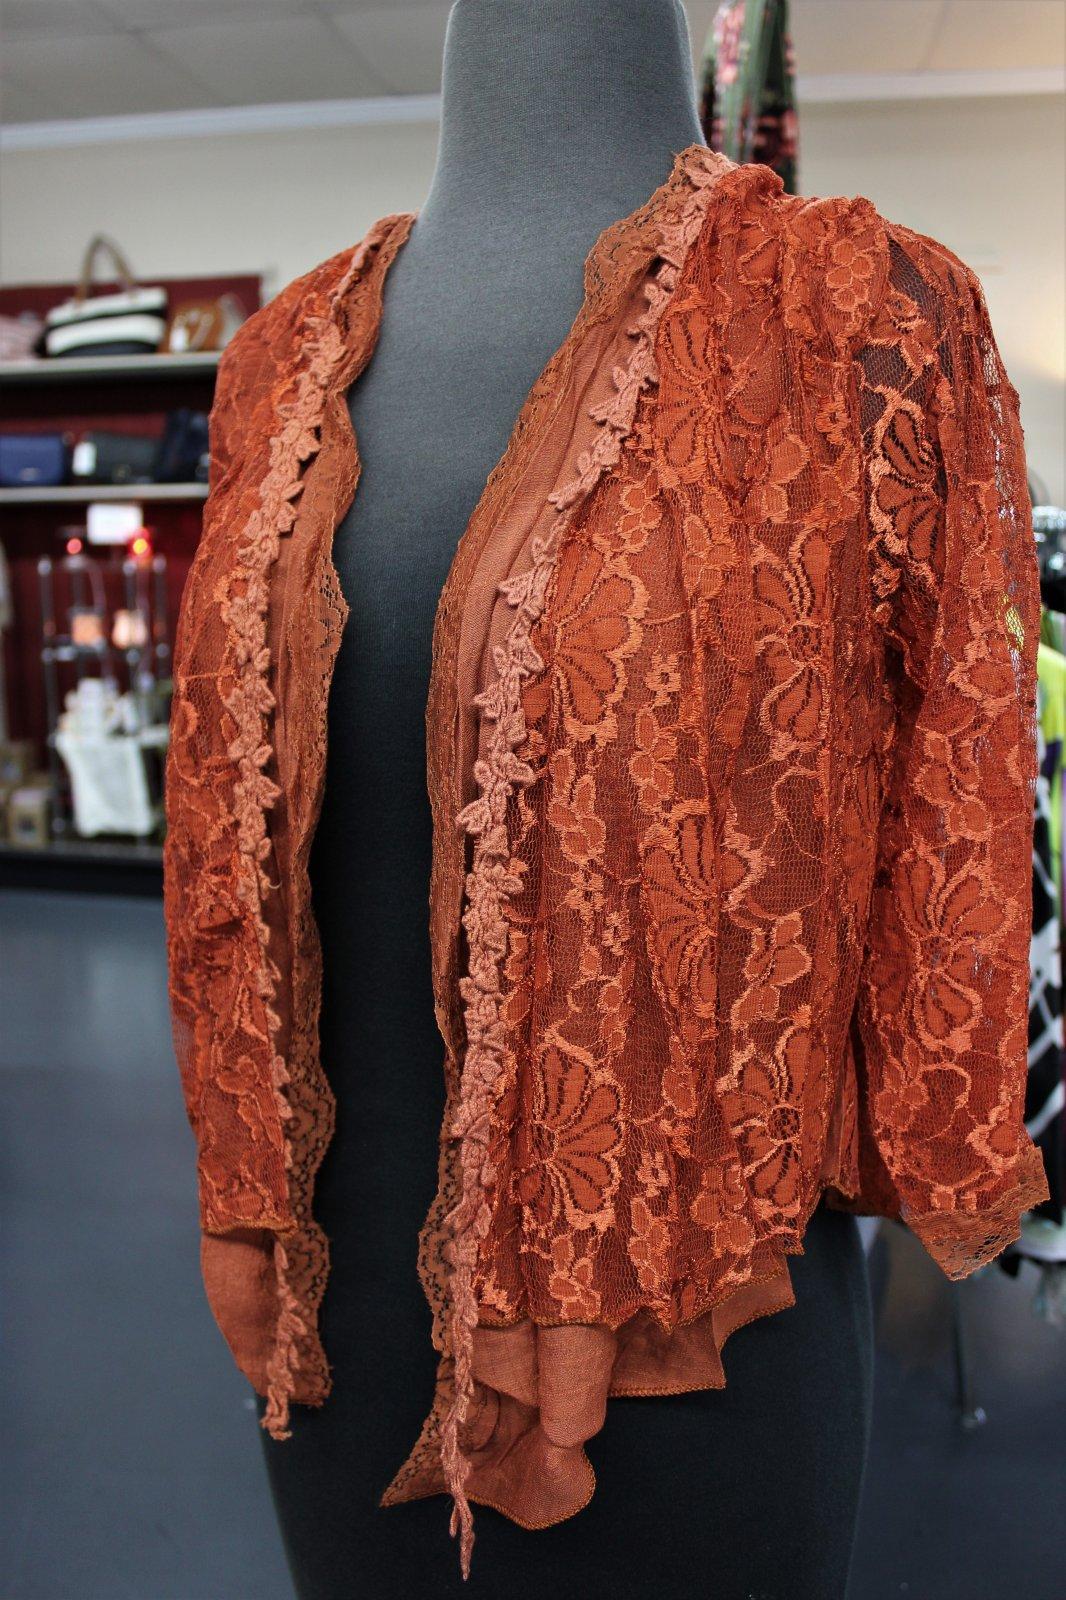 Pretty Angel Rust Bolero w/lace